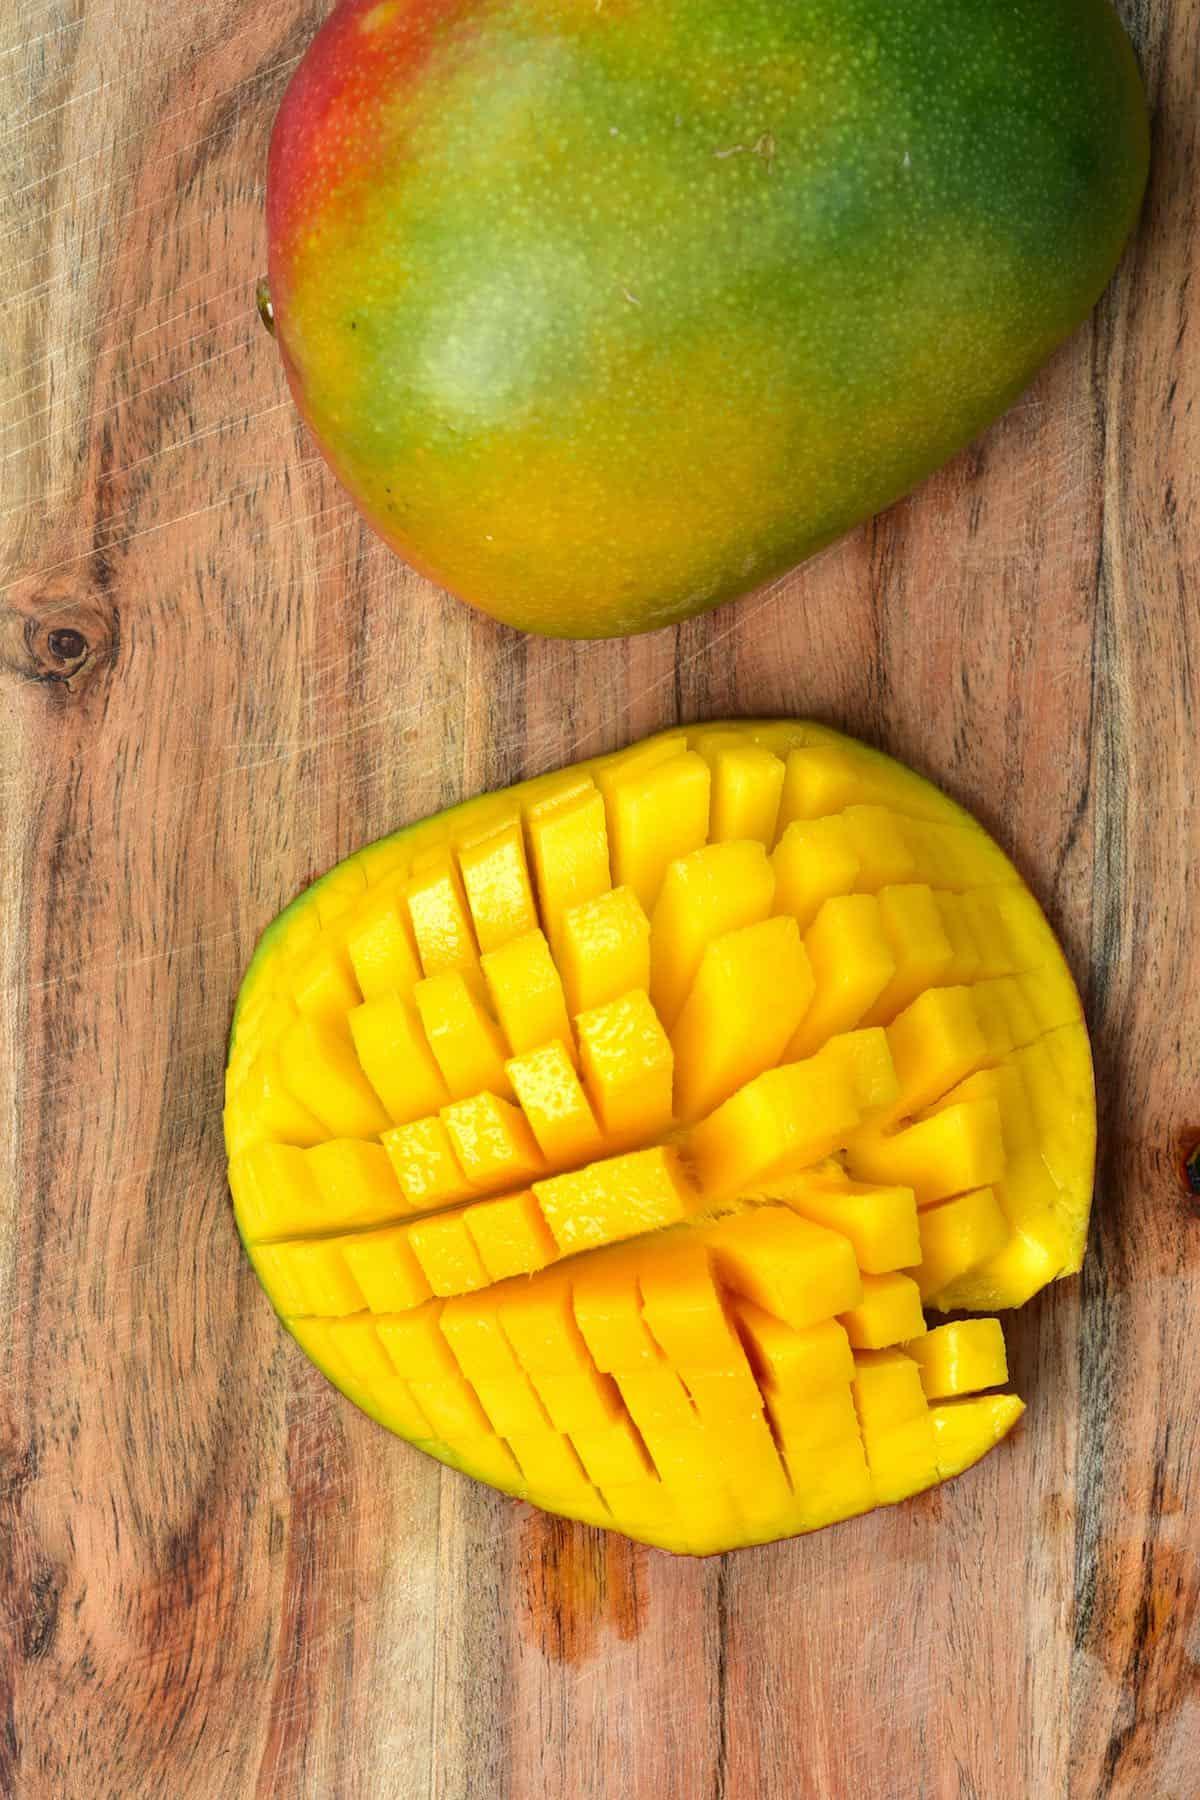 Diced mango on a wooden board